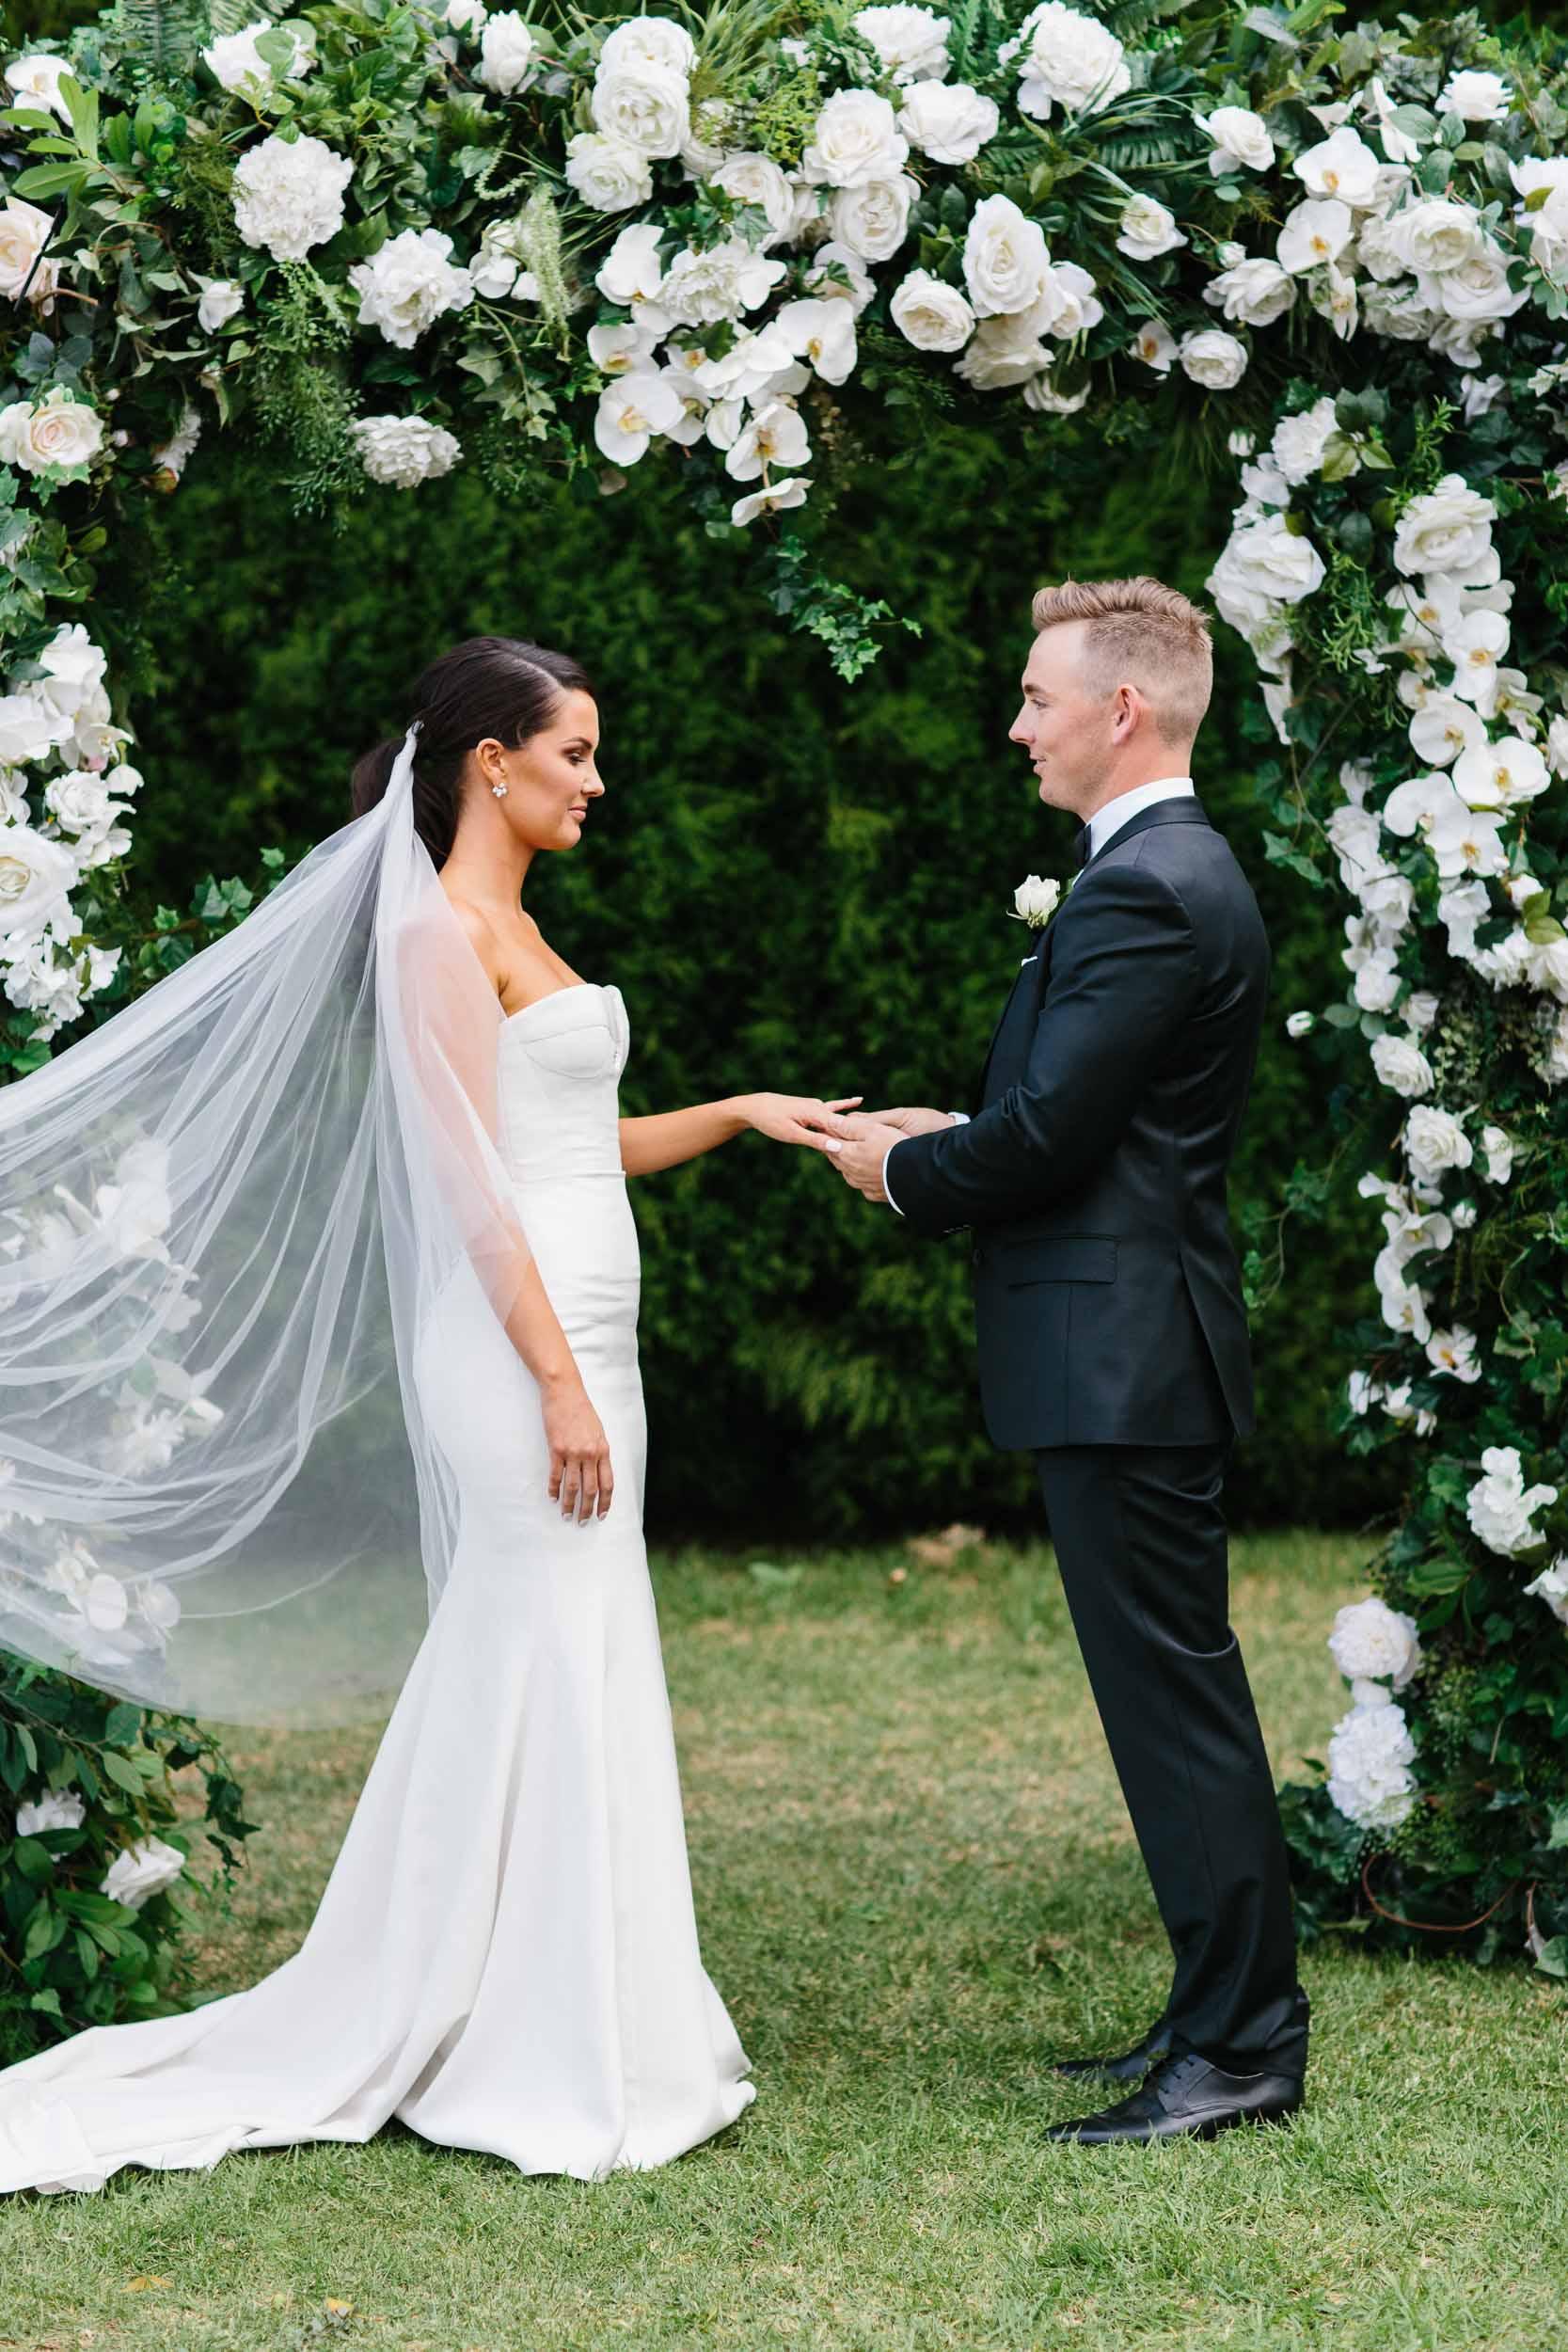 Kas-Richards-Melbourne-Garden-Wedding-Aerial-South-Whark-Georgia-Young-Couture-213.jpg